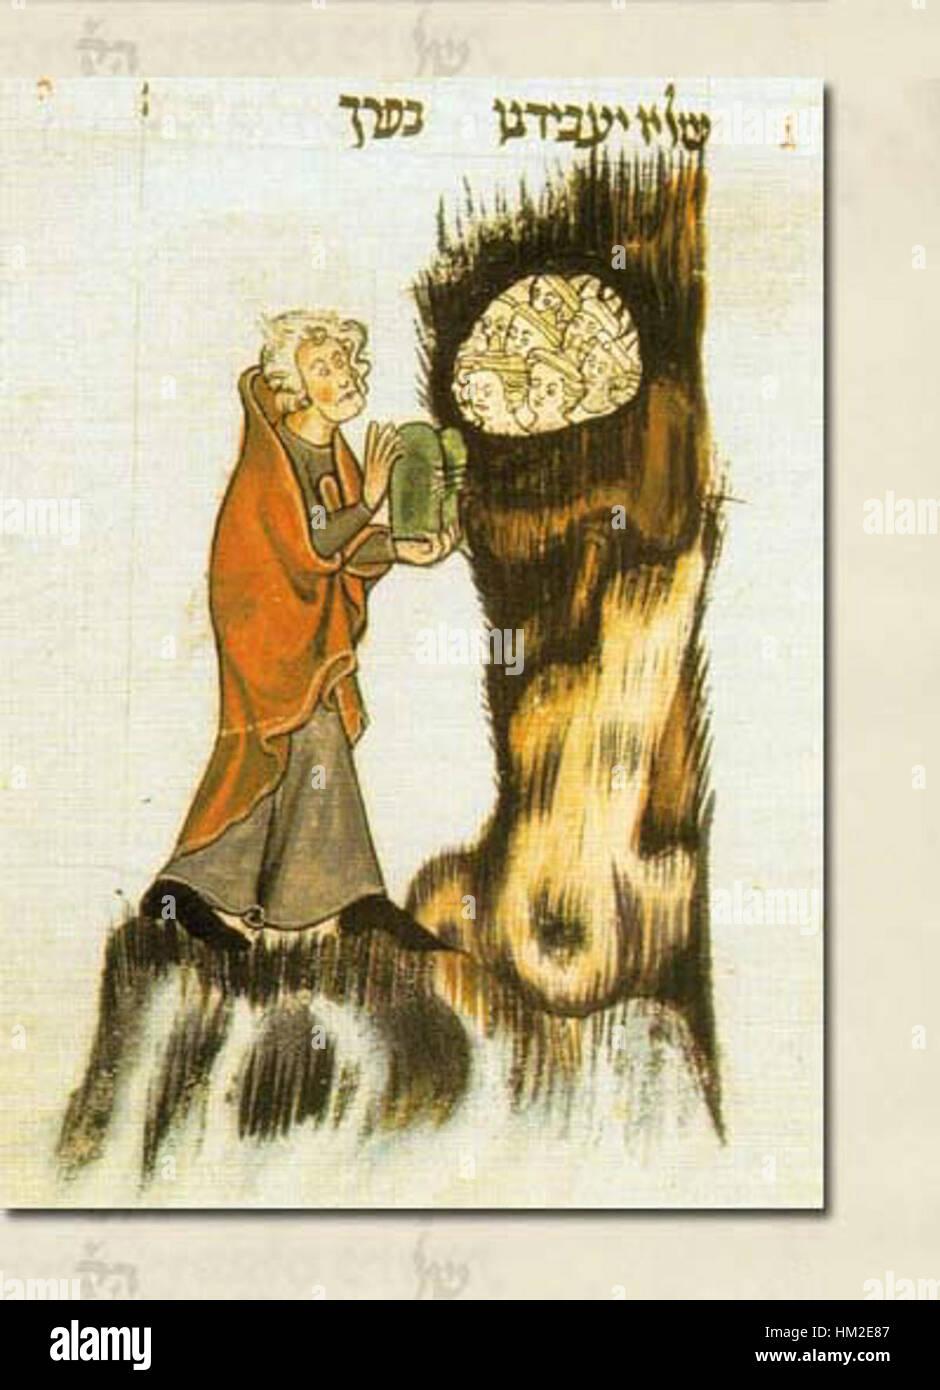 Illustration-mishneh-torah-moses-en - Stock Image